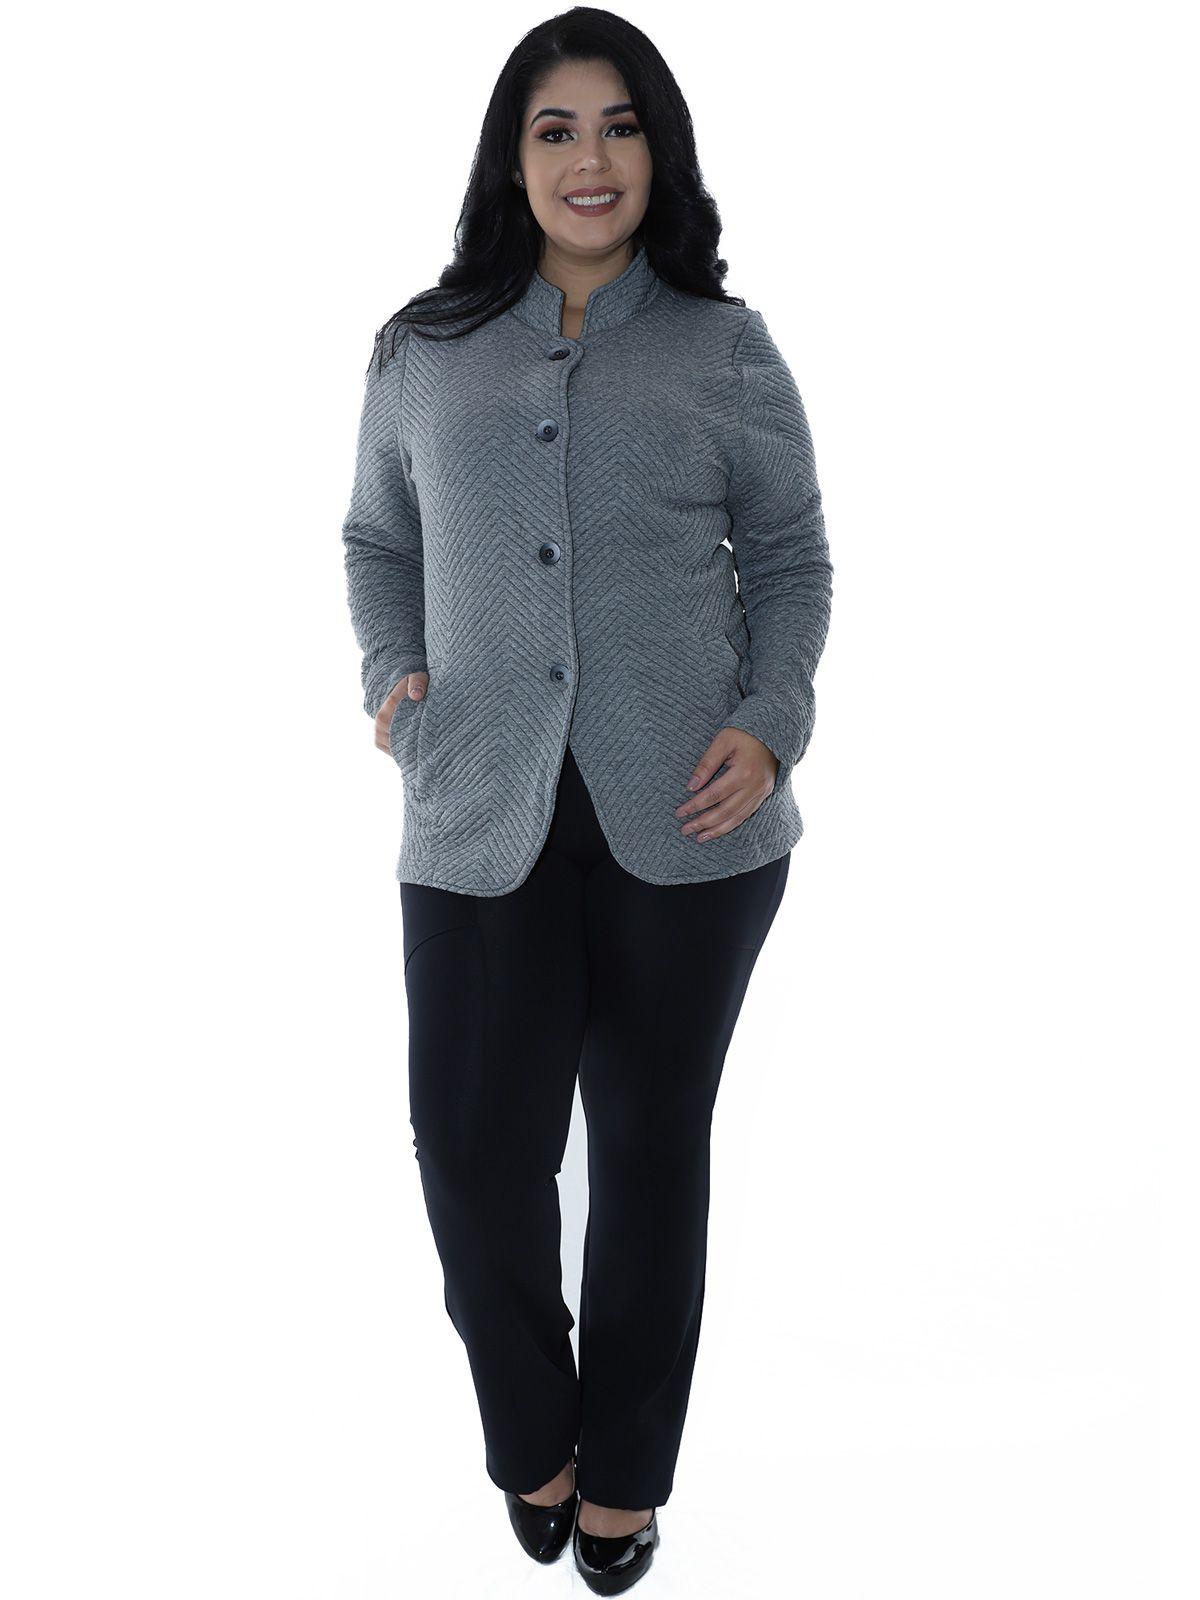 Casaco Plus Size Matelasse com Botões Mescla